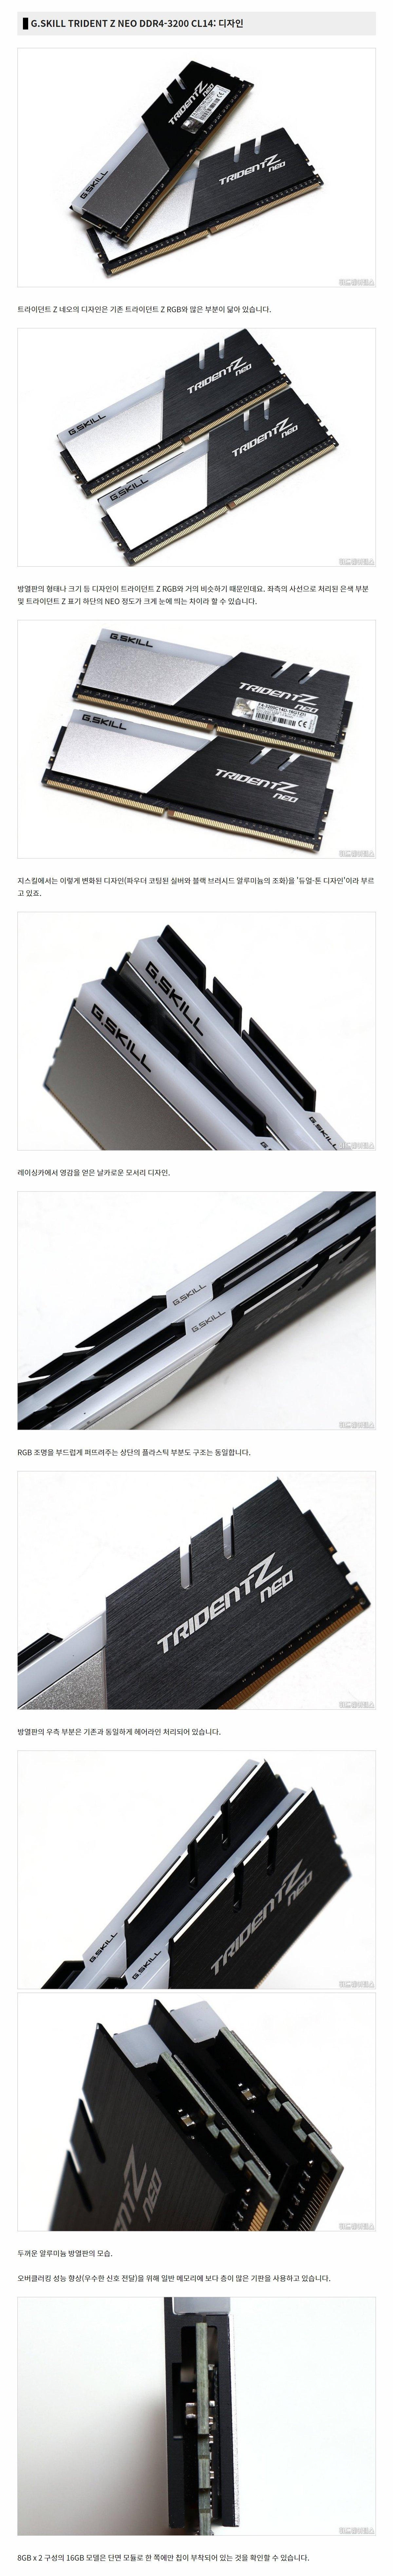 G.SKILL DDR4 16G PC4-25600 CL14 TRIDENT Z NEO (8Gx2) 리뷰 4.jpg